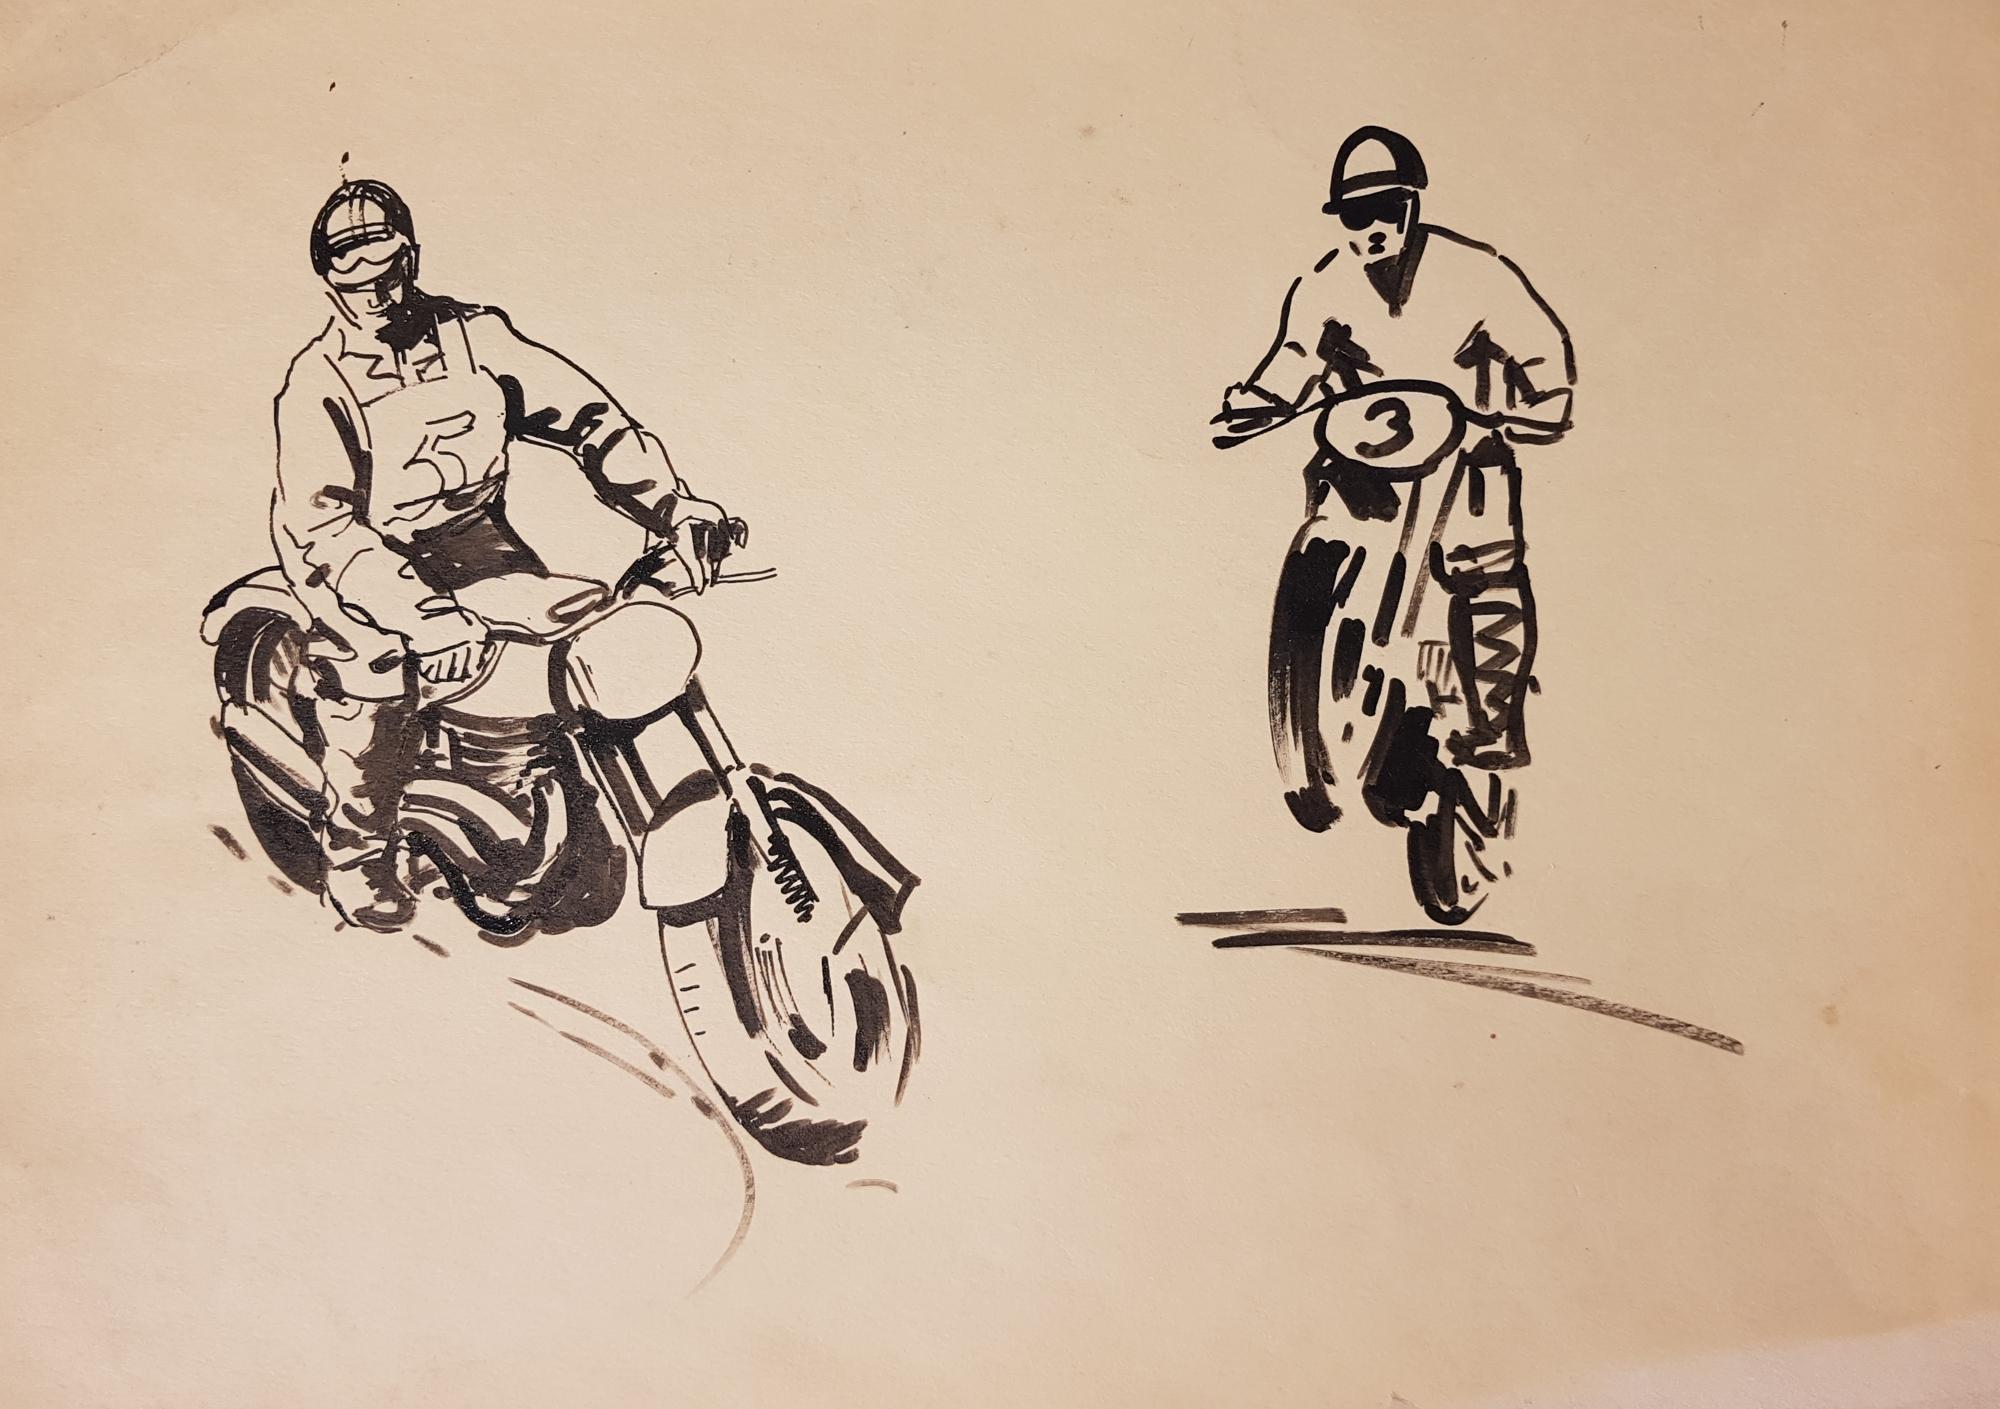 Щербинин Виктор Владимирович. Гонки на мотоциклах